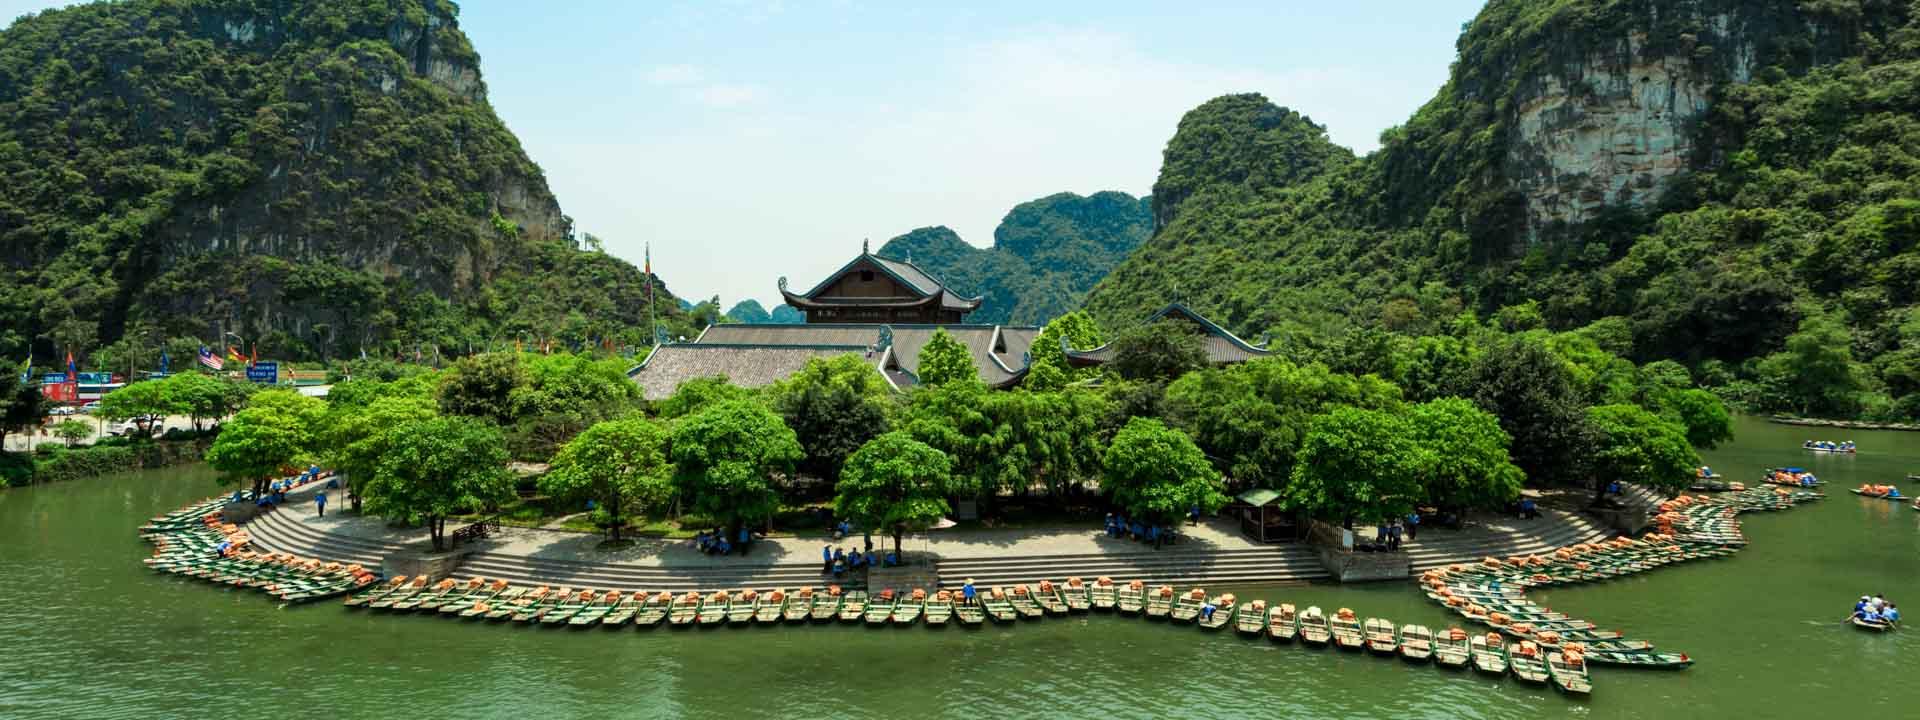 Hoa Lu Ancient Capital and Van Long Ecotourism Site